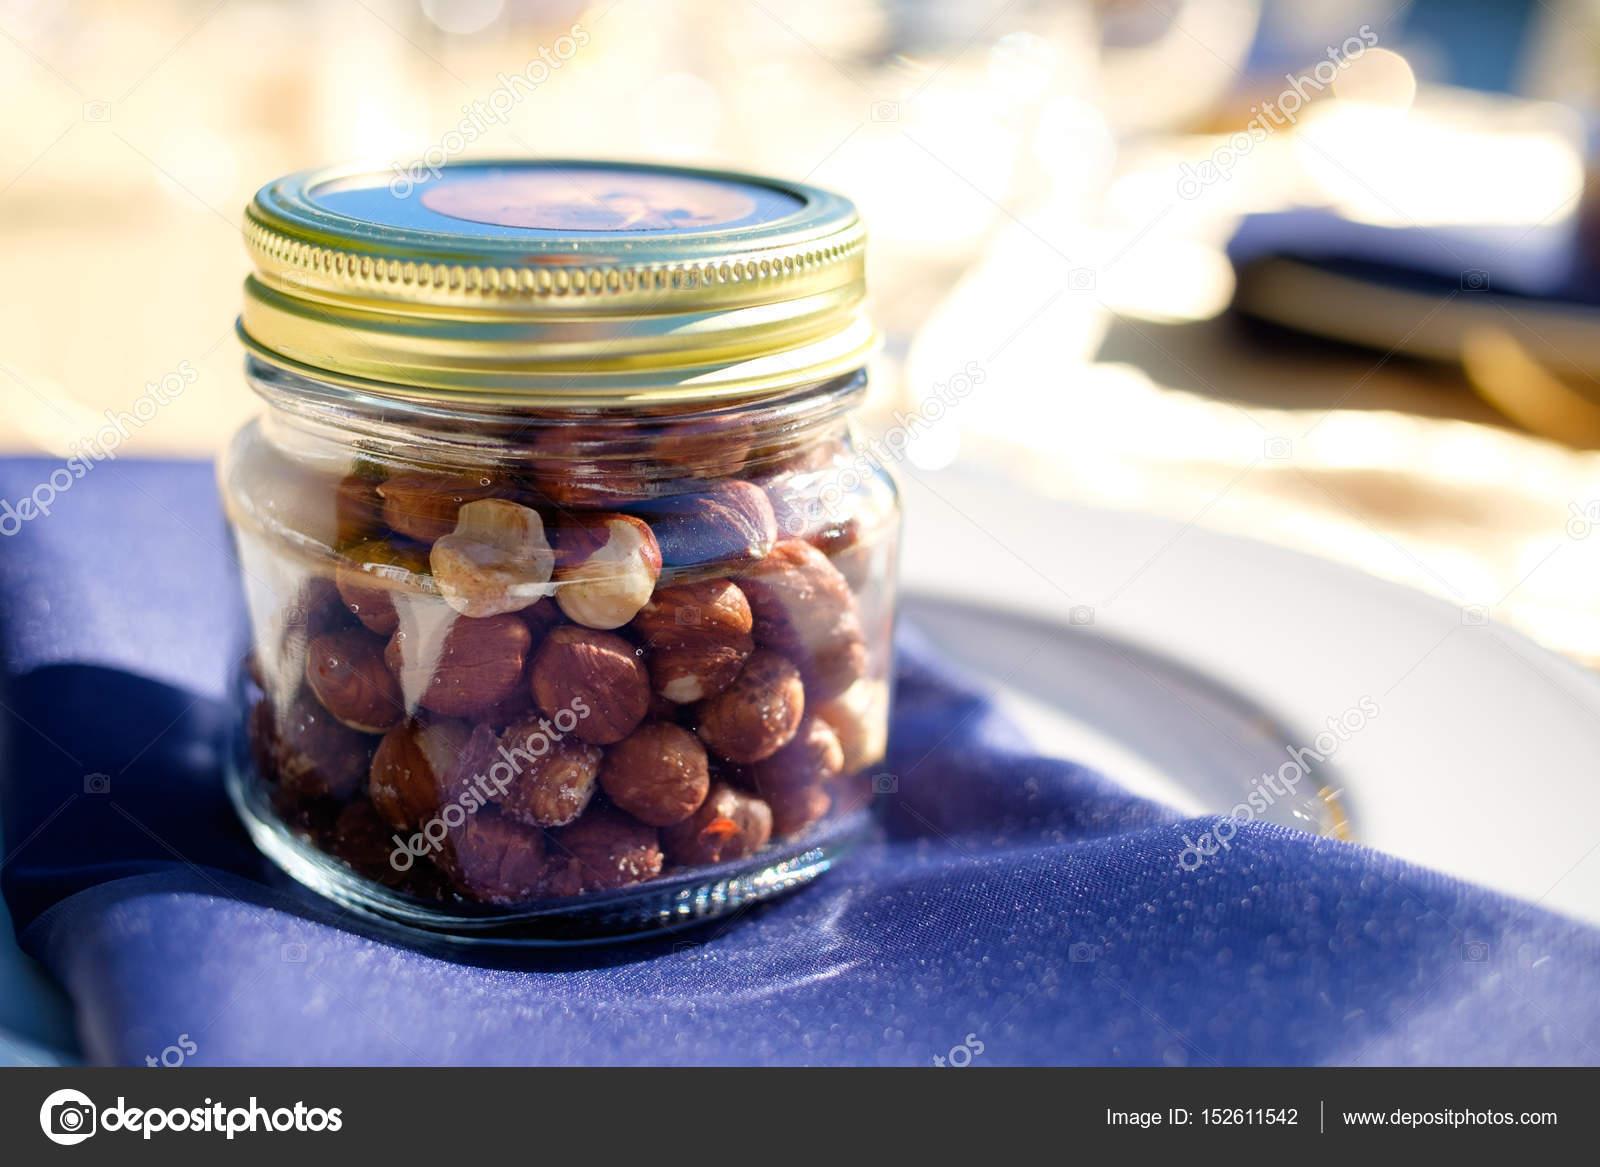 Haselnuss Hochzeitsgeschenke Stockfoto C Joshuarainey 152611542